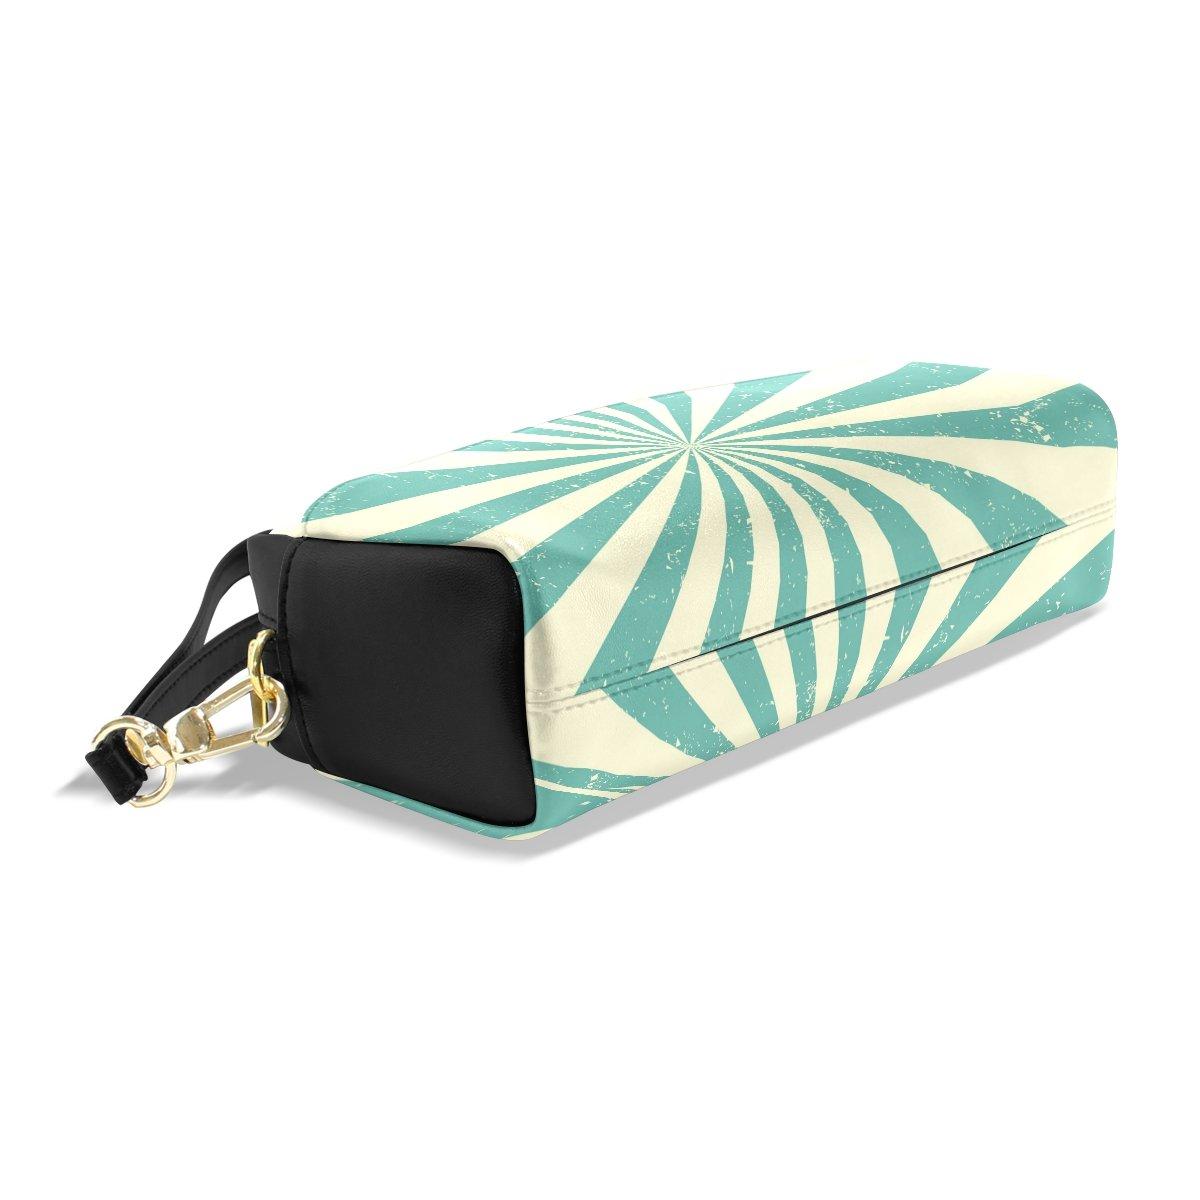 BENNIGIRY Retro Vintage Sonne Sonne Sonne Bleistift Fall tragbar Pen Tasche Student Schreibwaren Pouch PU Leder Groß Kapazität Reißverschluss Make-up Kosmetiktasche B07BF5QRYQ     | Billig  6b6e88